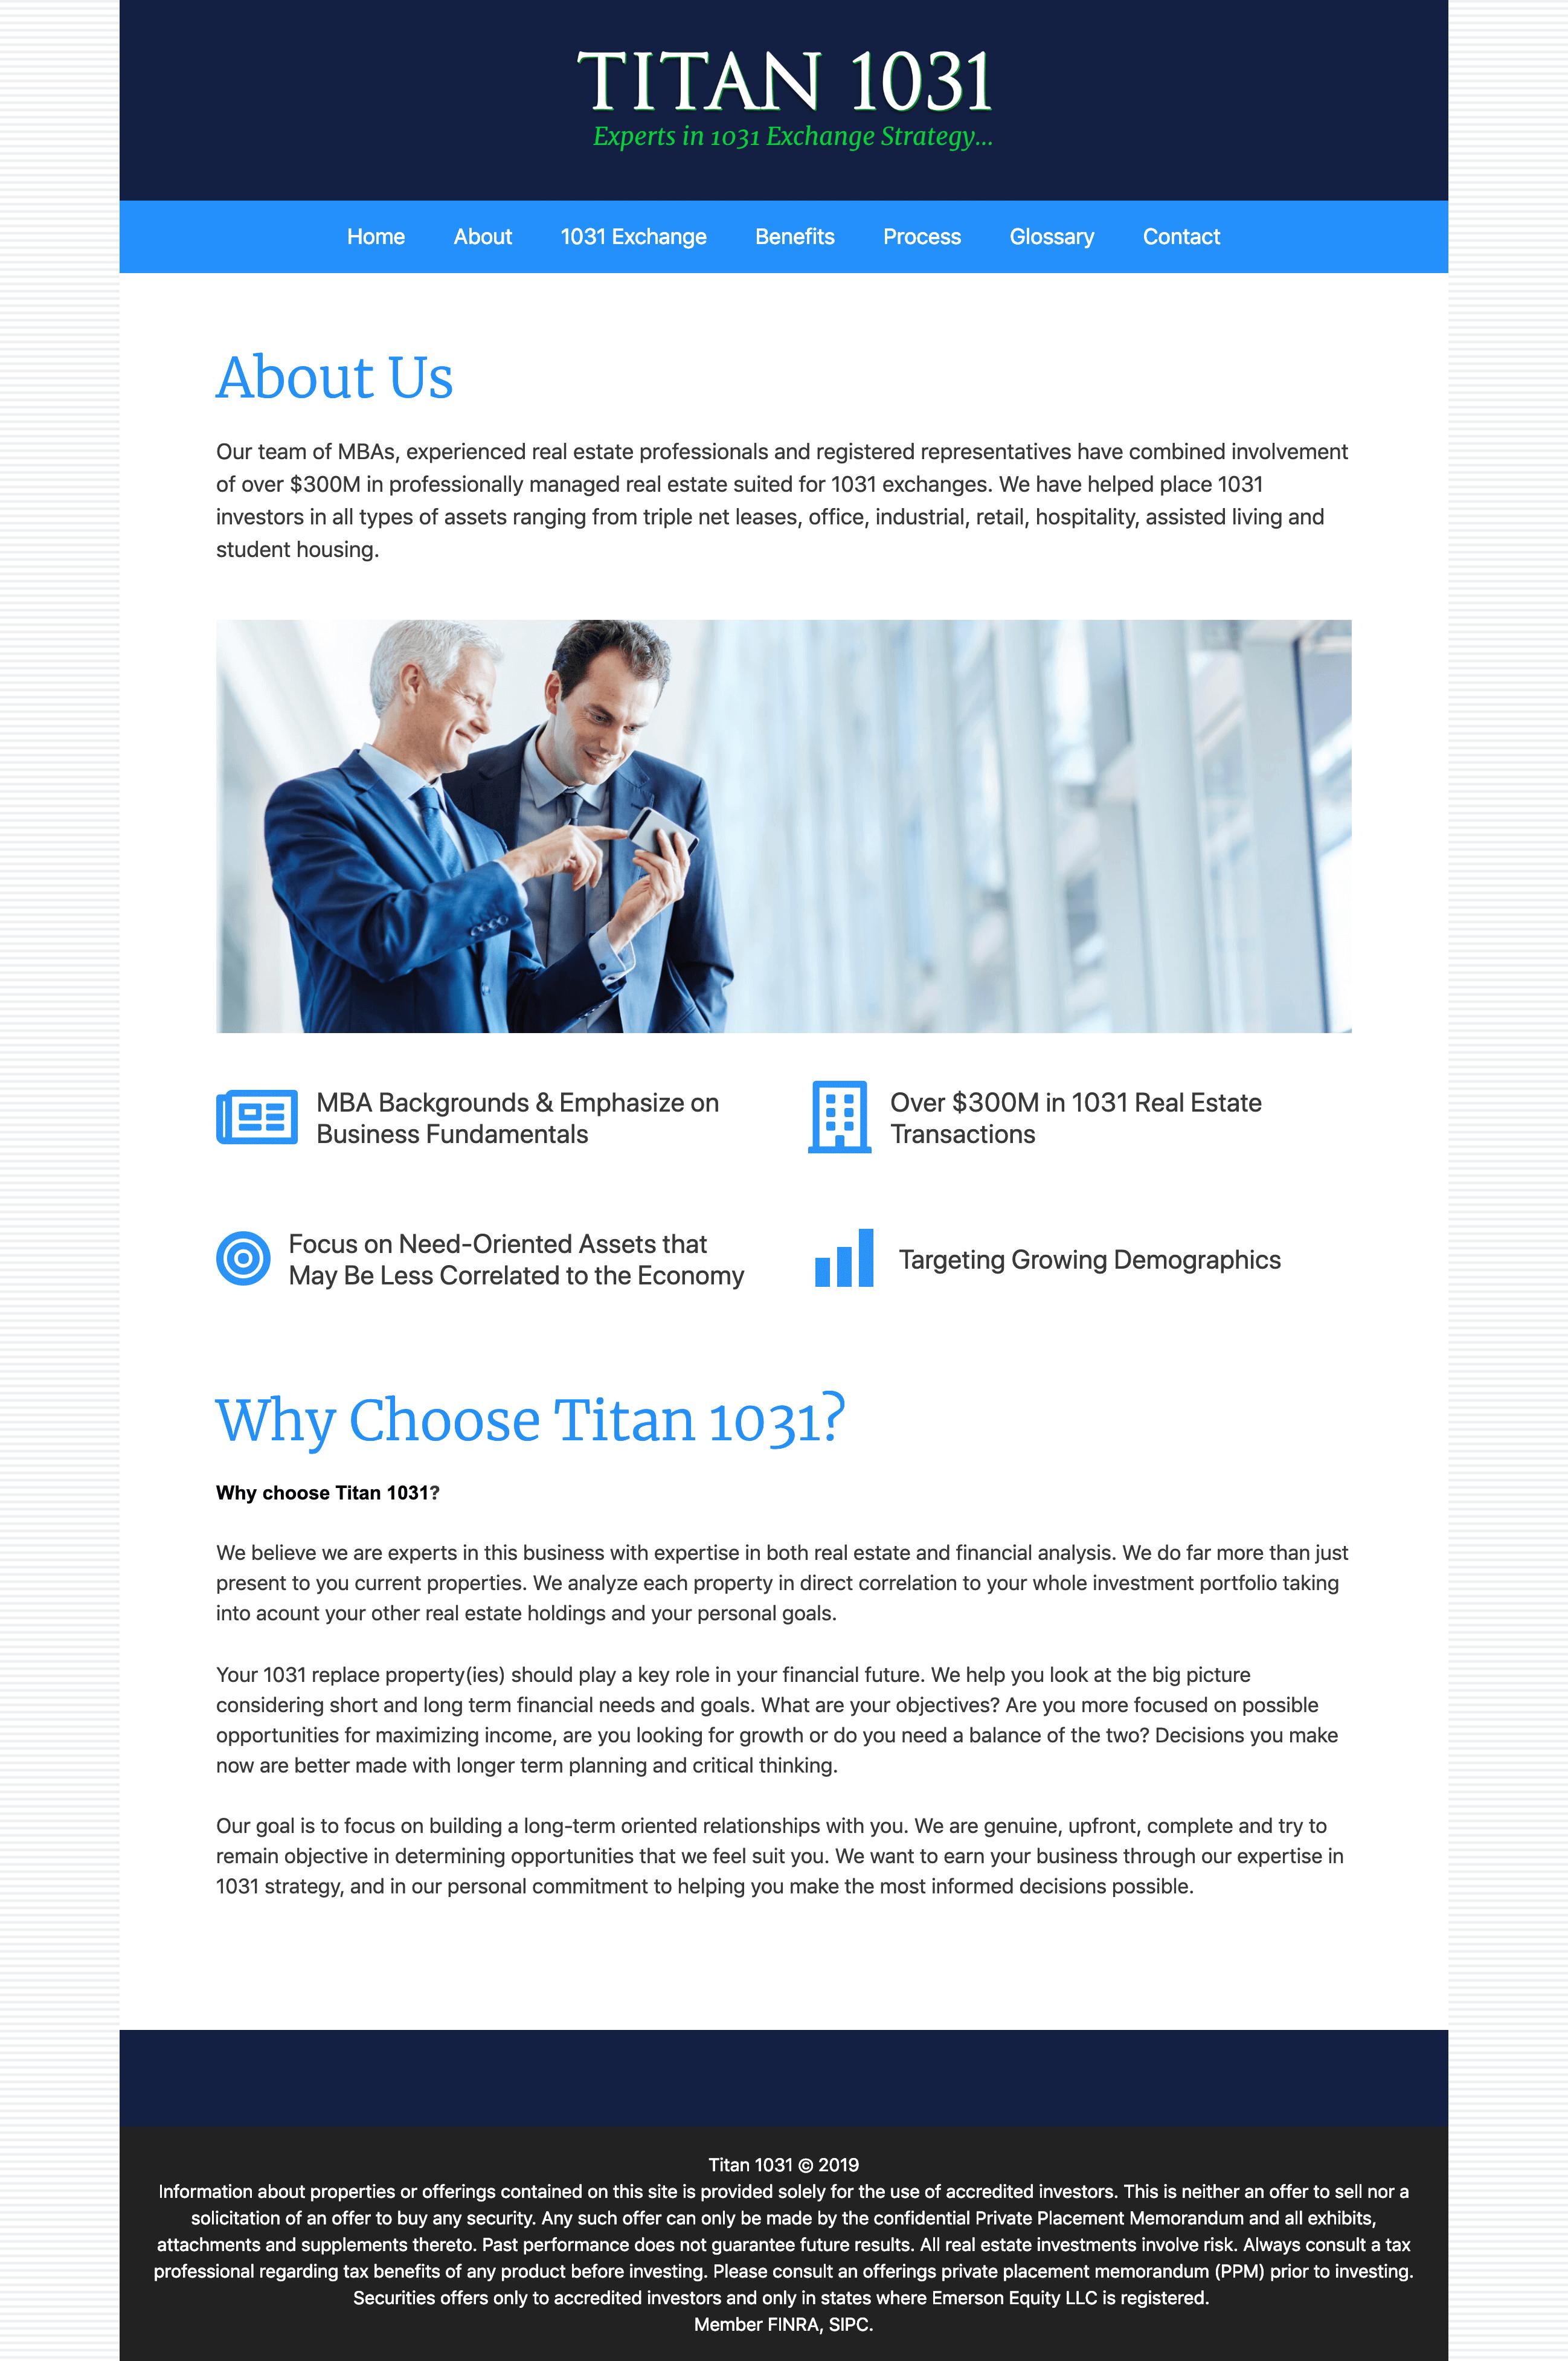 Titan-1031-Real-Estate-Exchange-Website-Design-About-Page